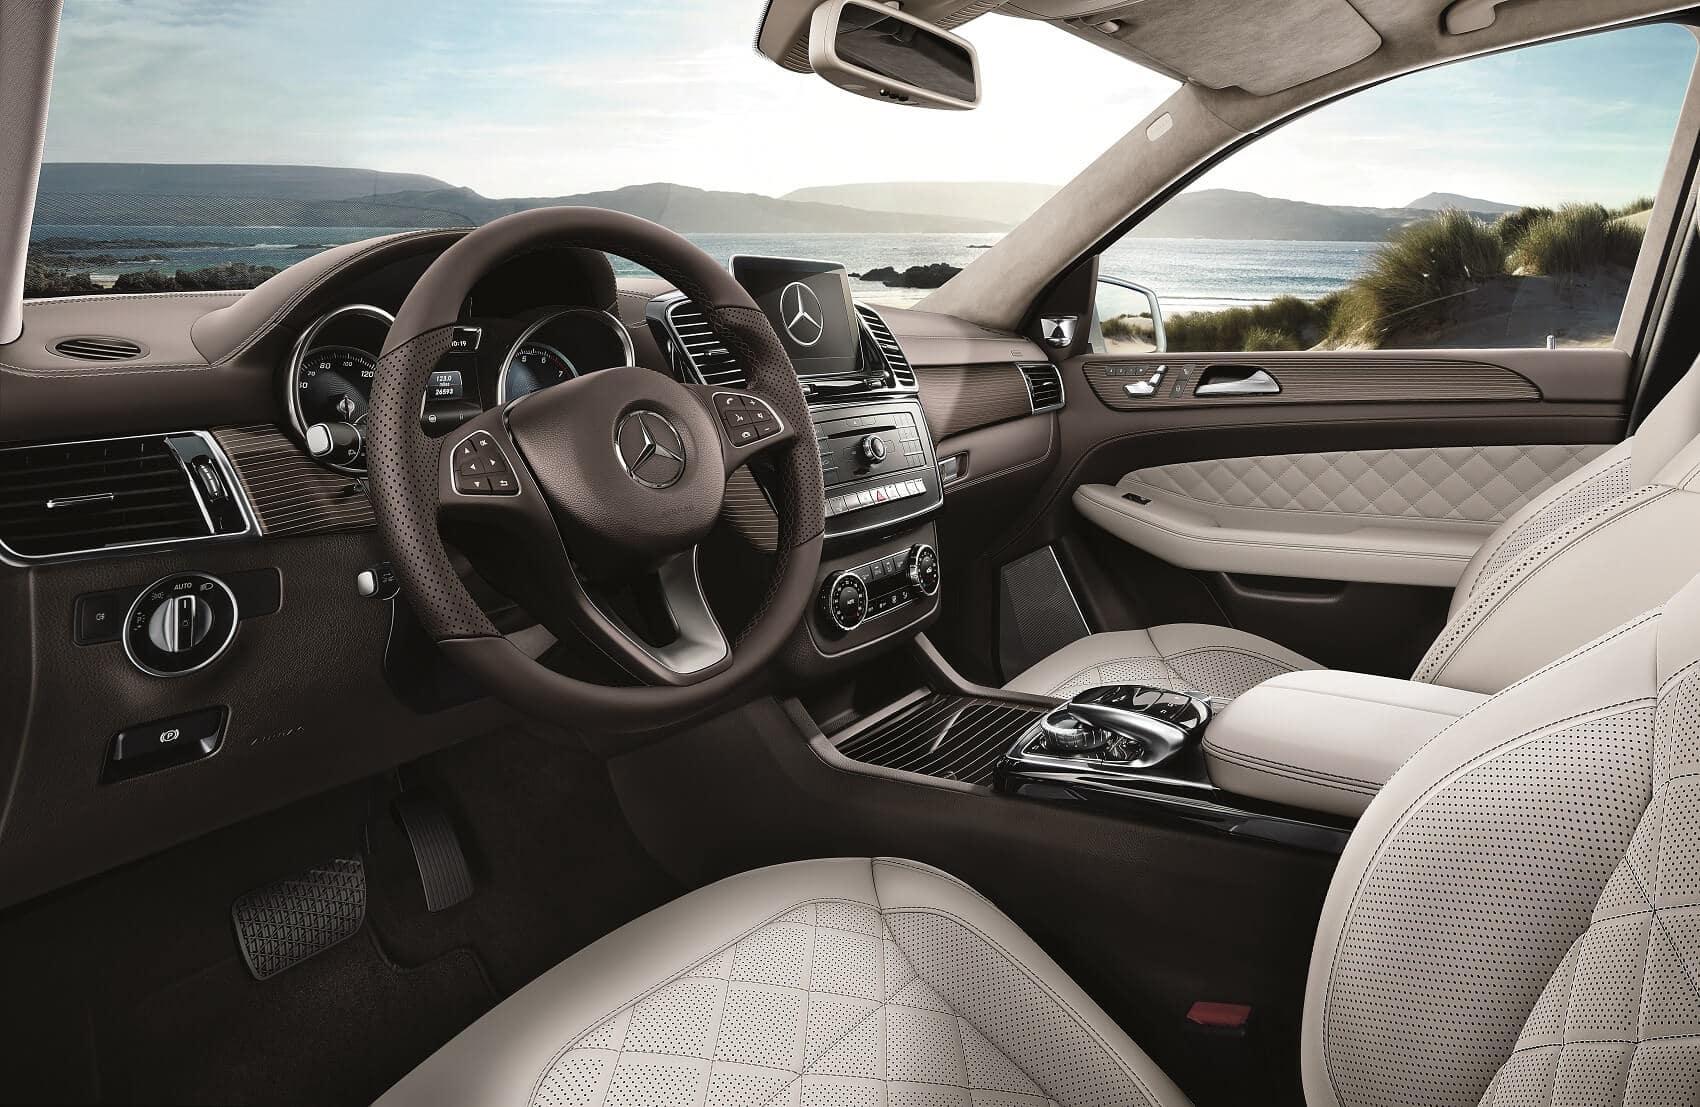 Mercedes Benz GLS Interior Comfort